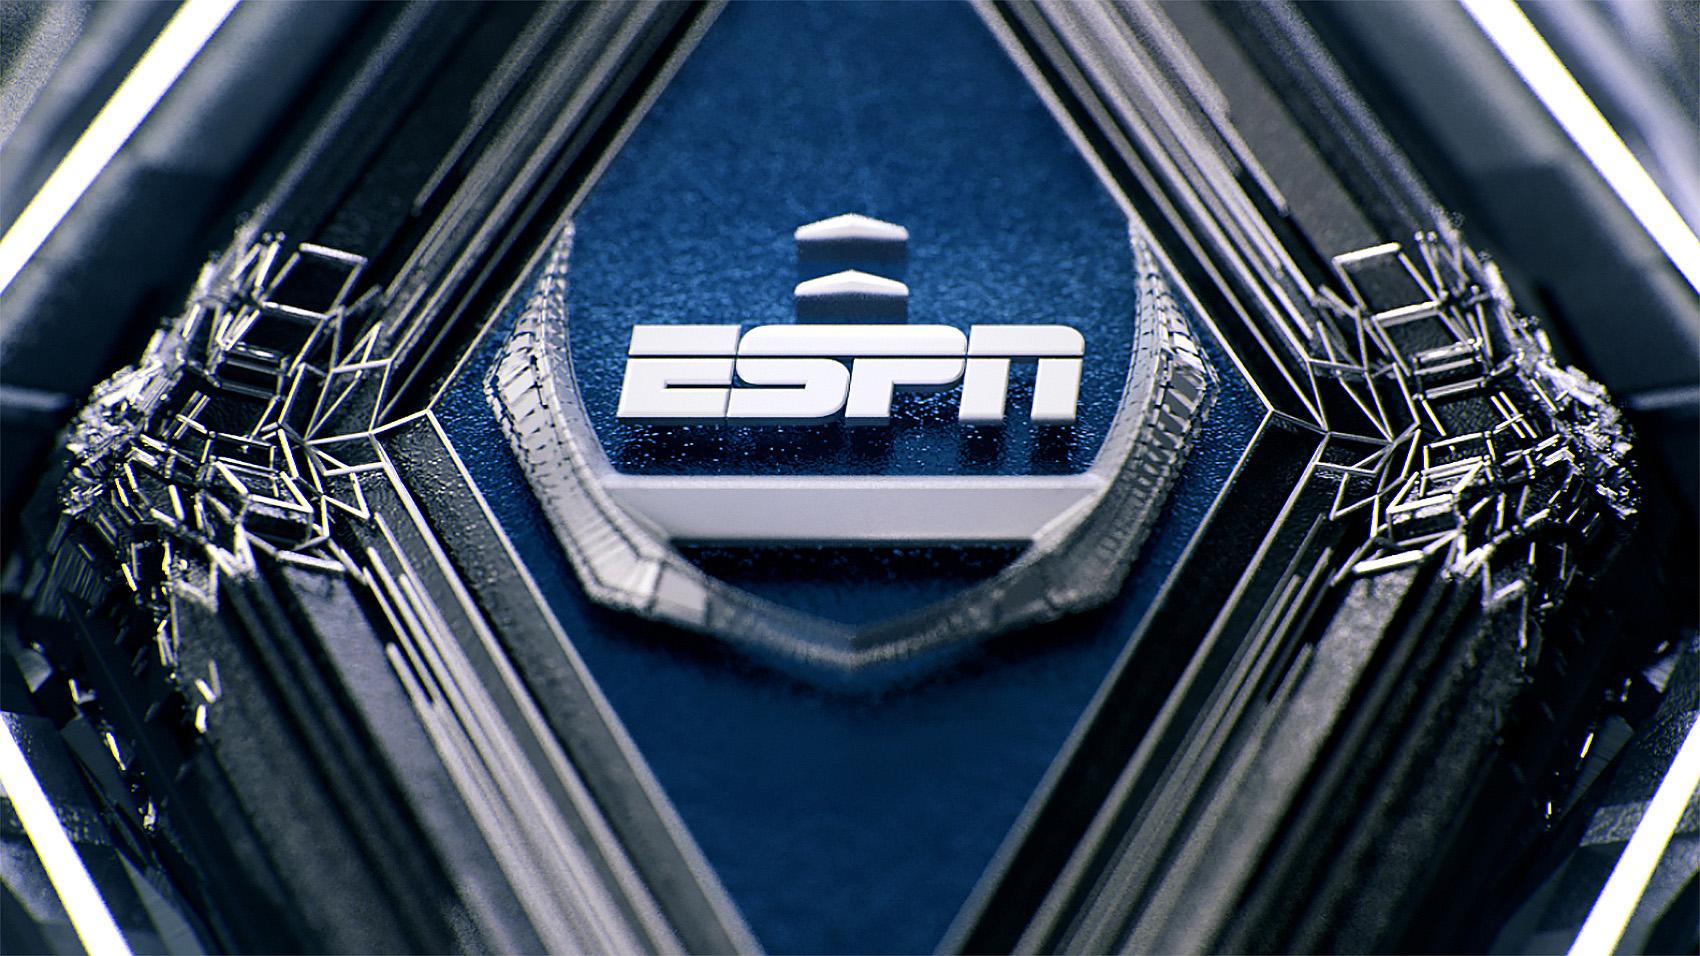 NCS_ESPN-College-Football-Broadcast-Design_0001